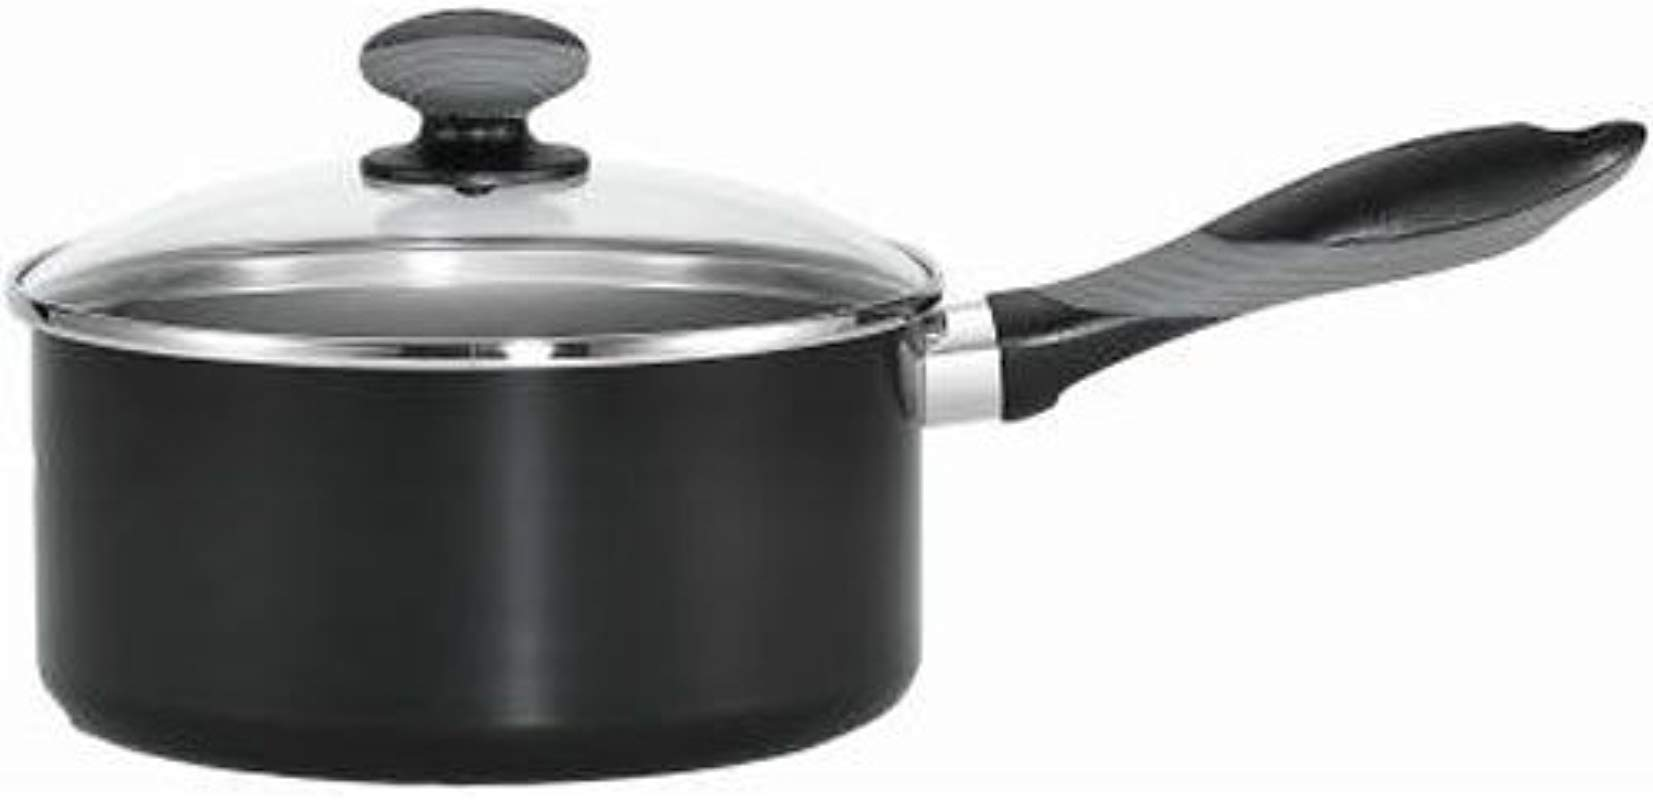 Mirro A79723 Get A Grip Aluminum Nonstick Sauce Pan With Glass Lid Cover Cookware 2 Quart Black